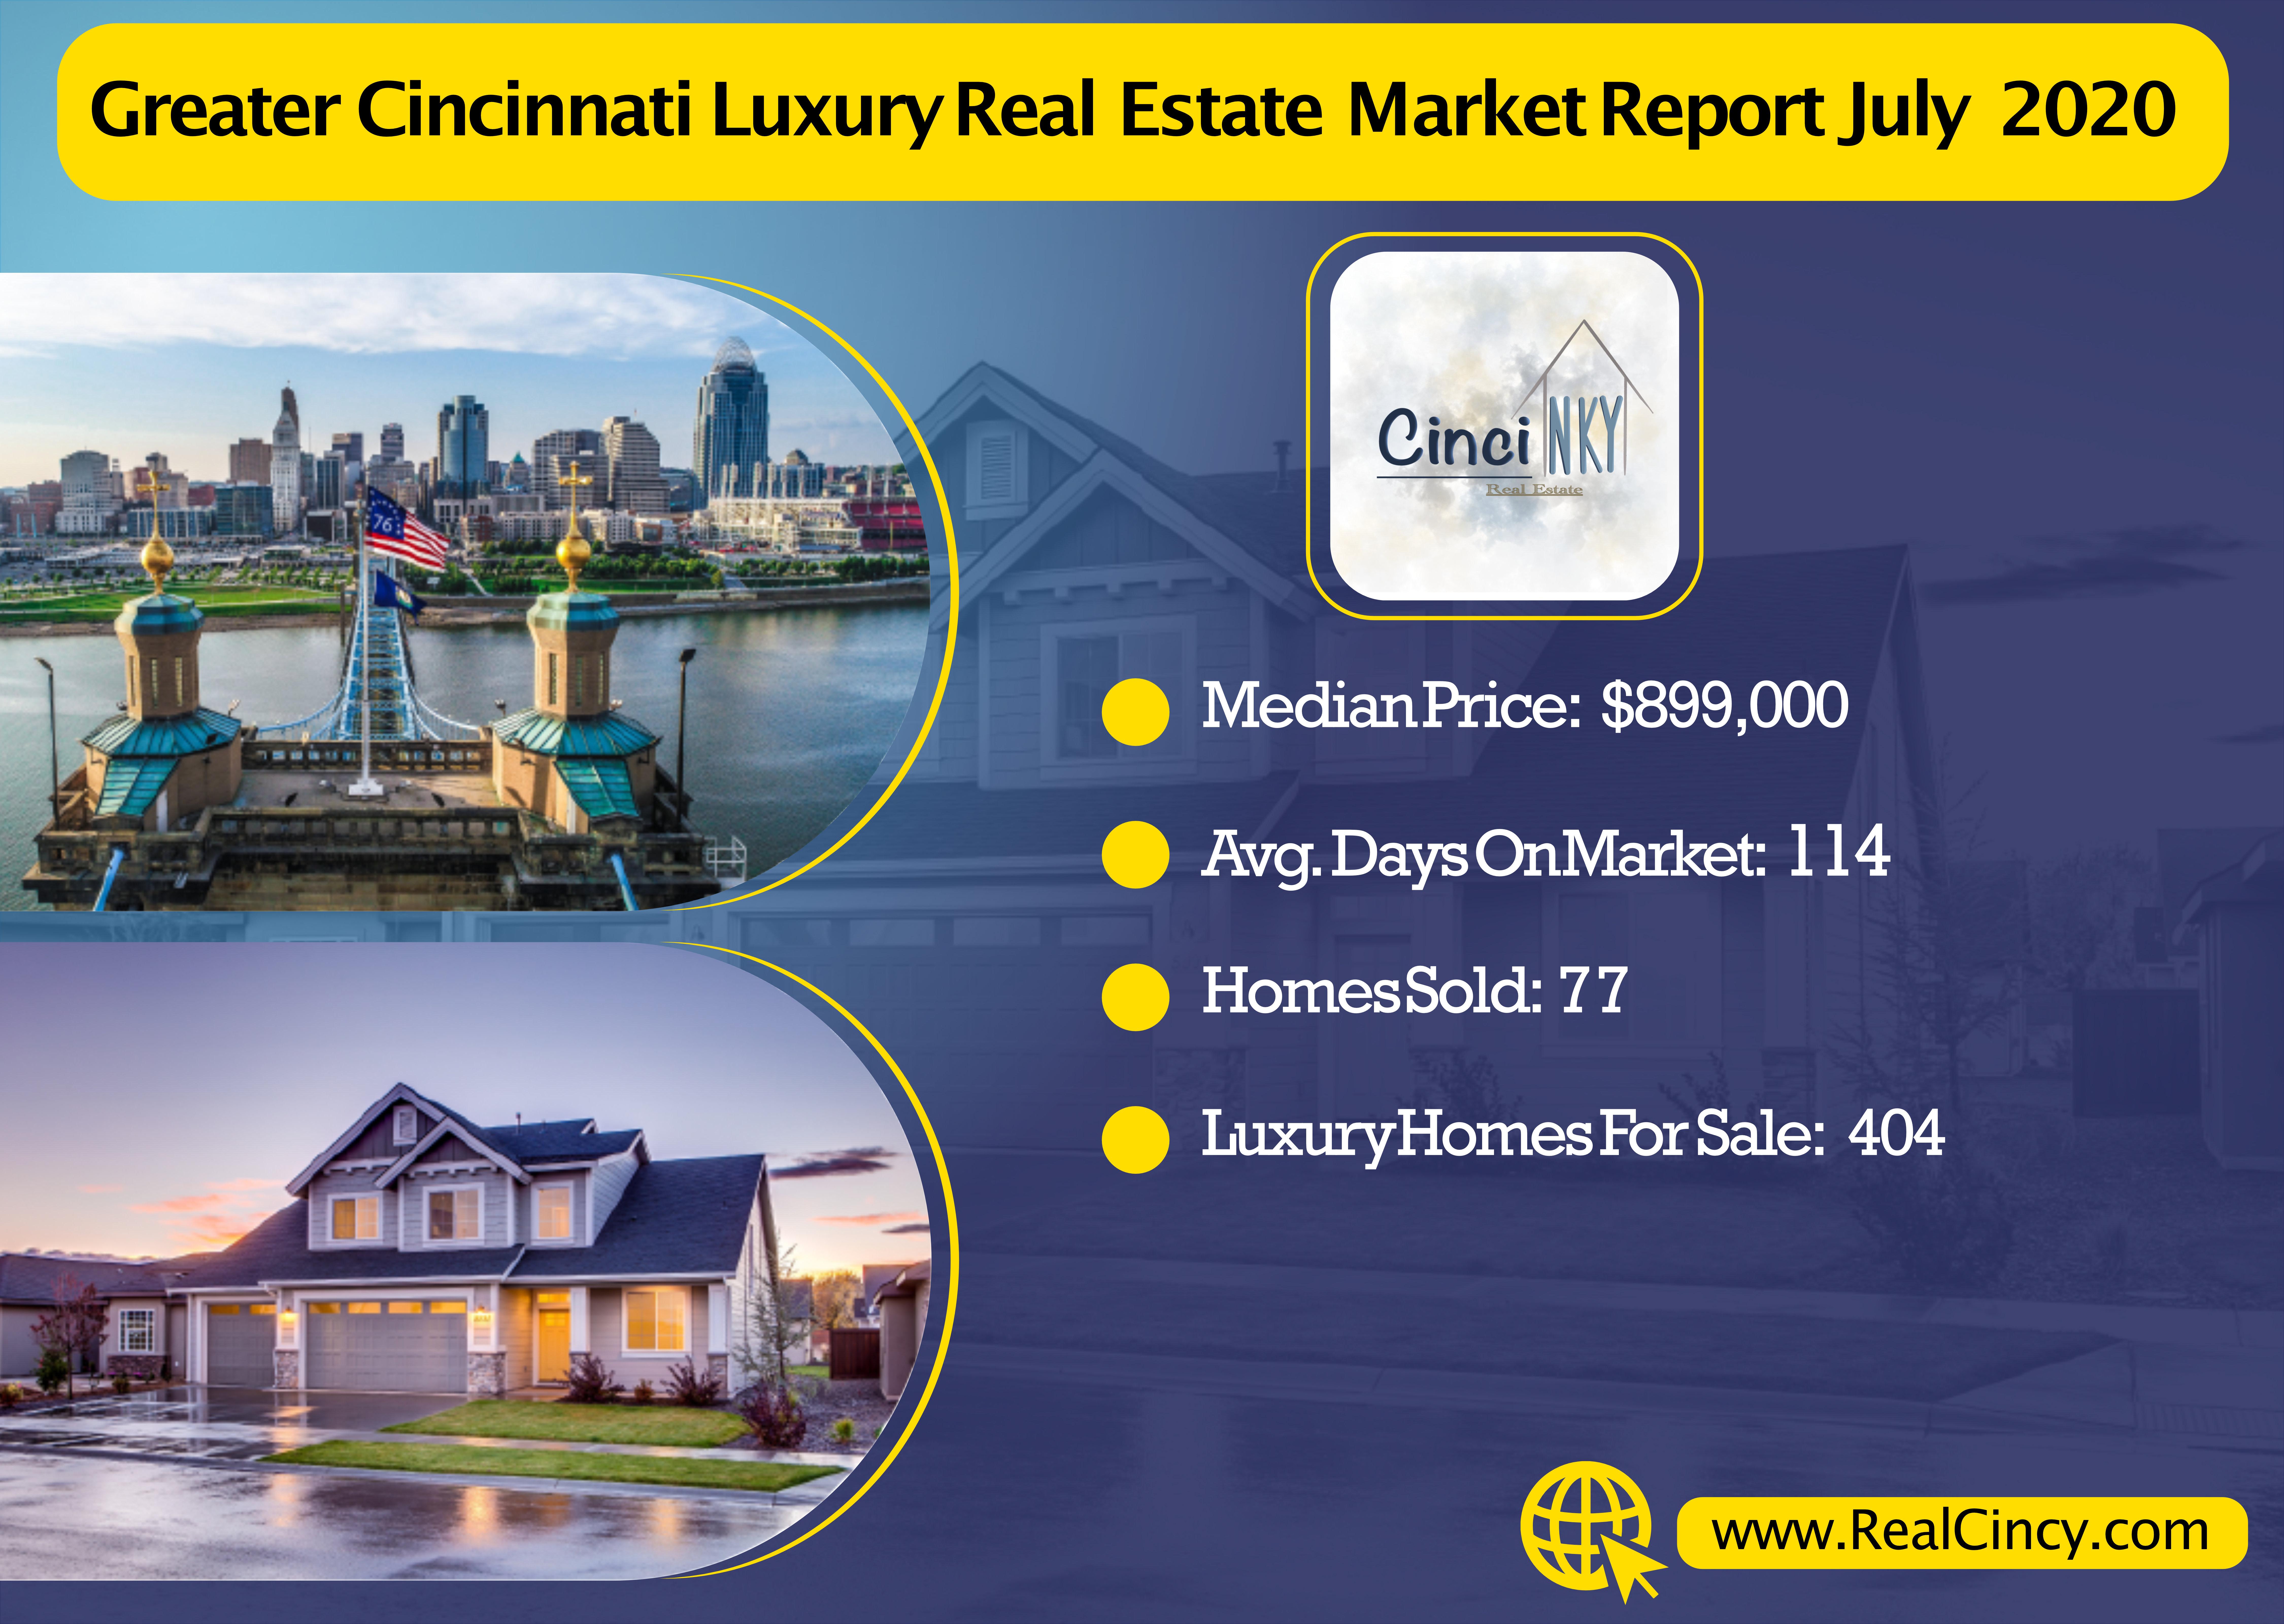 July 2020 Greater Cincinnati Luxury Real Estate Market Report